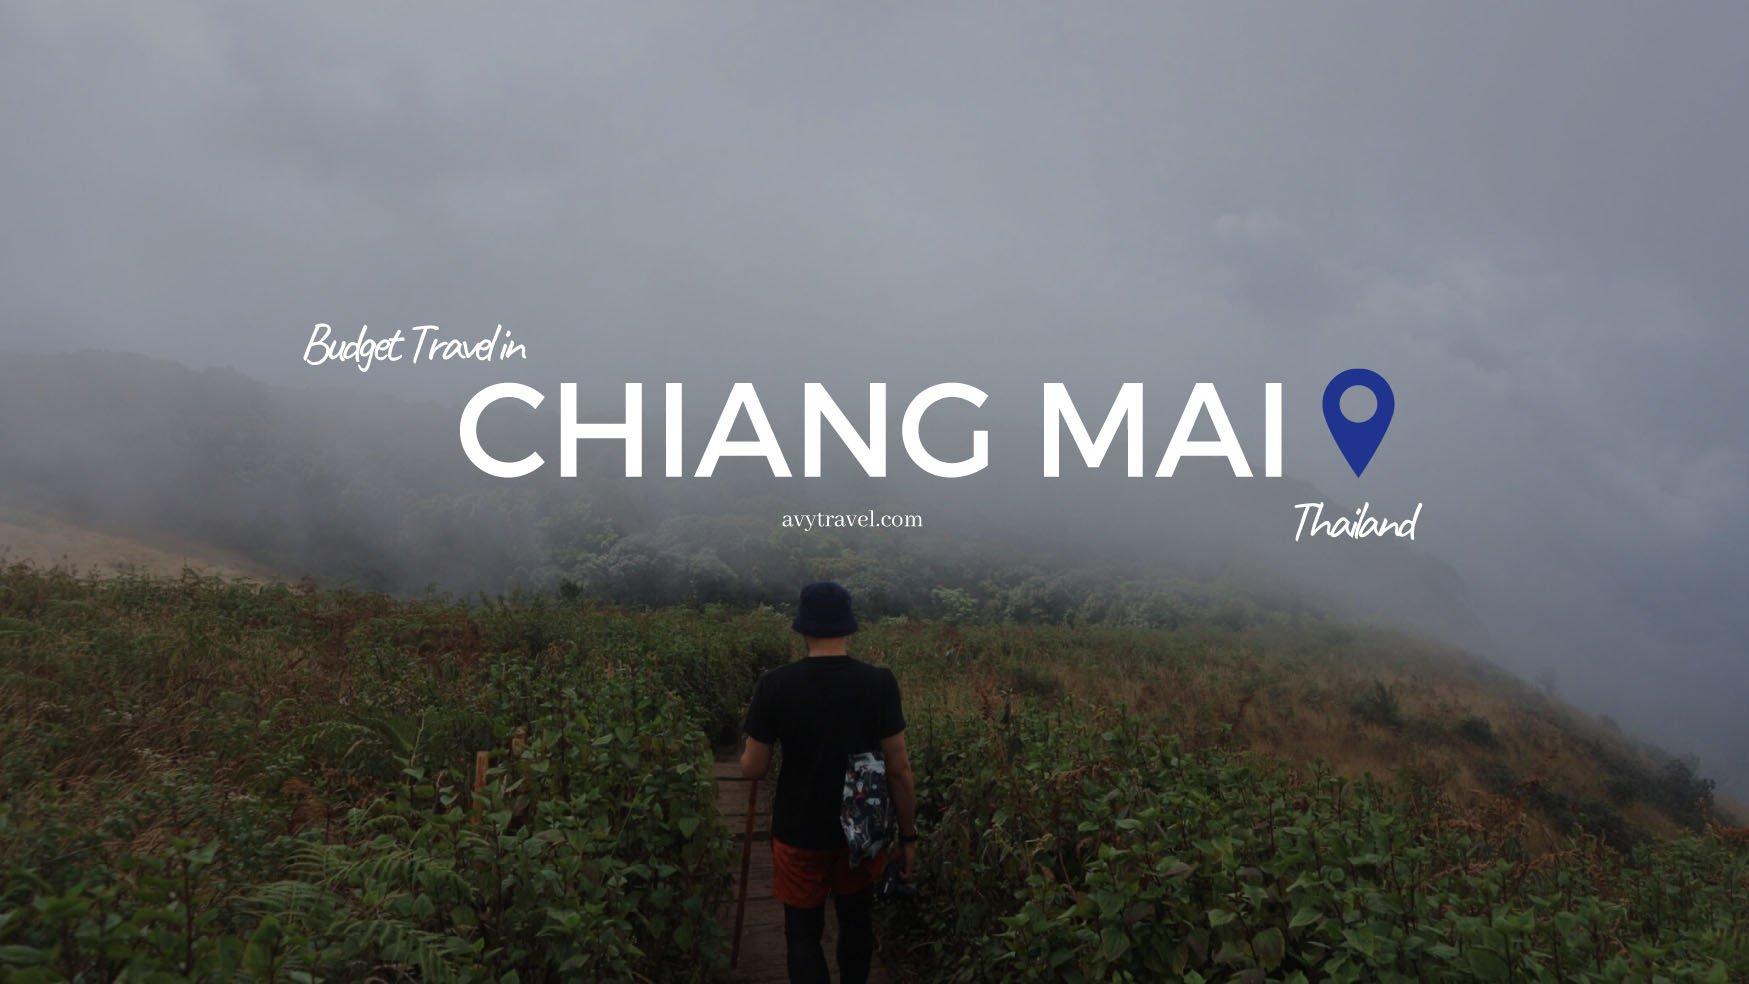 Budget Travel: Chiang Mai